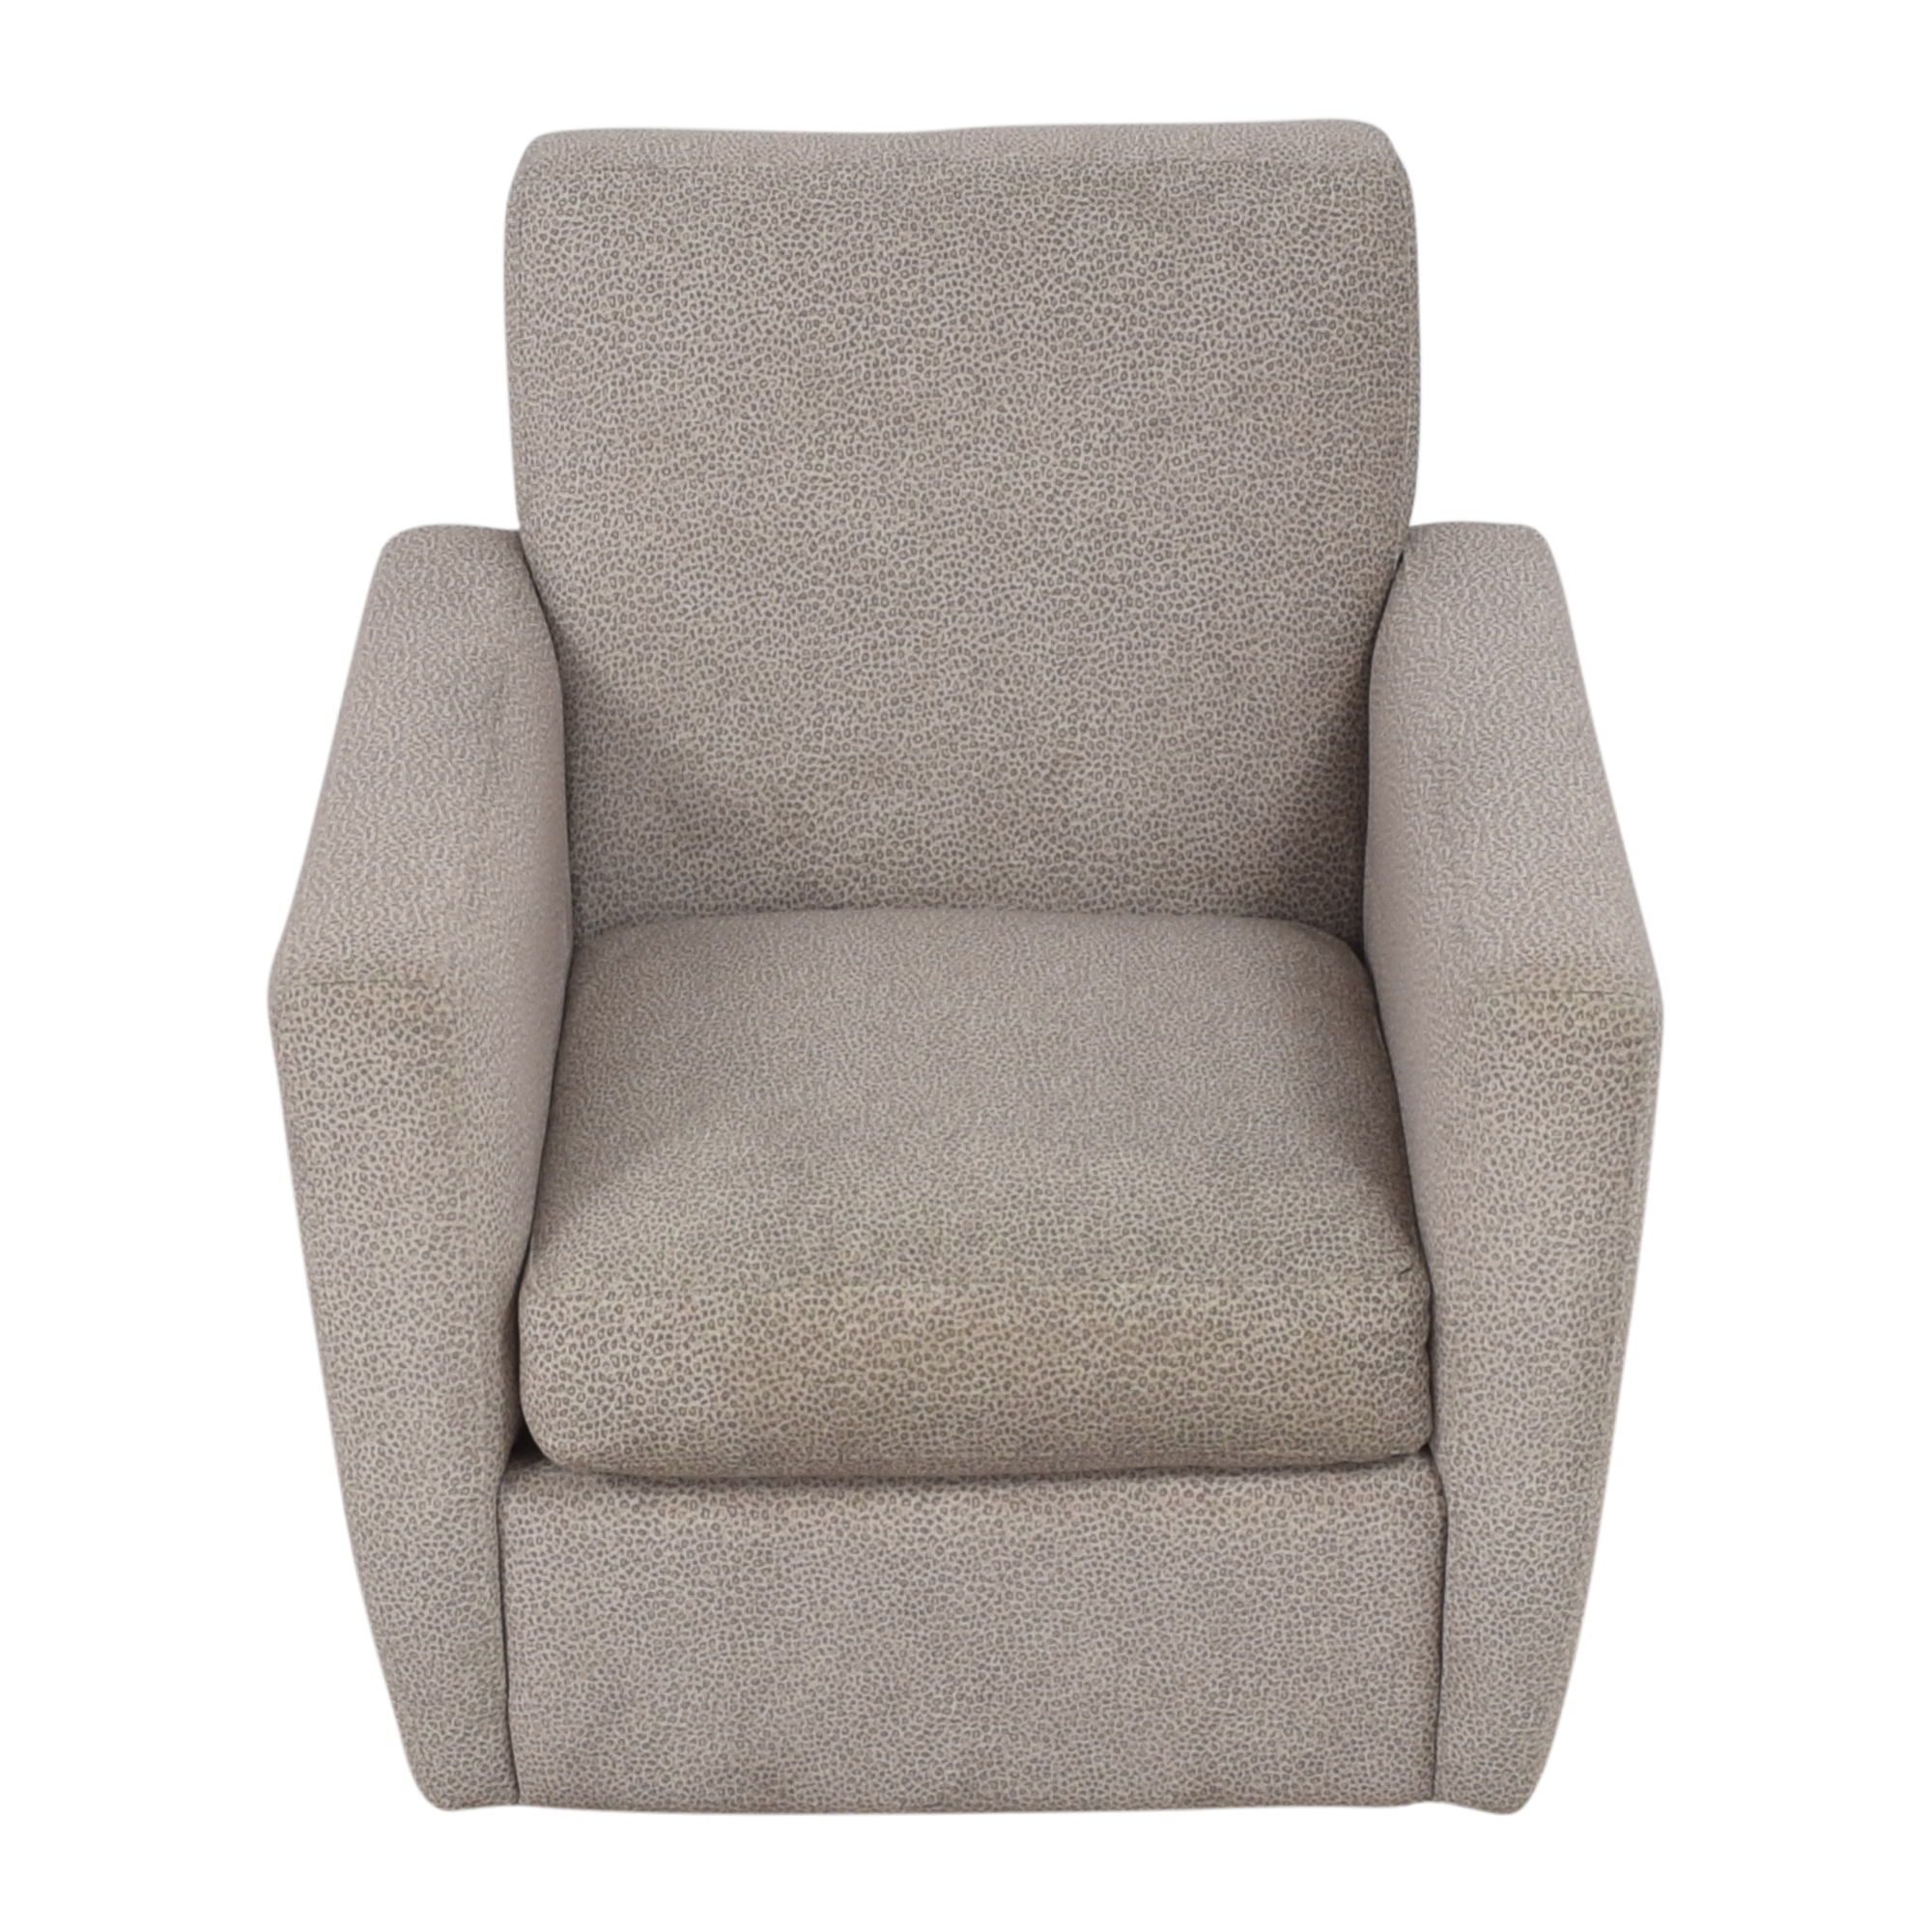 Macy's Ventura Swivel Chair sale